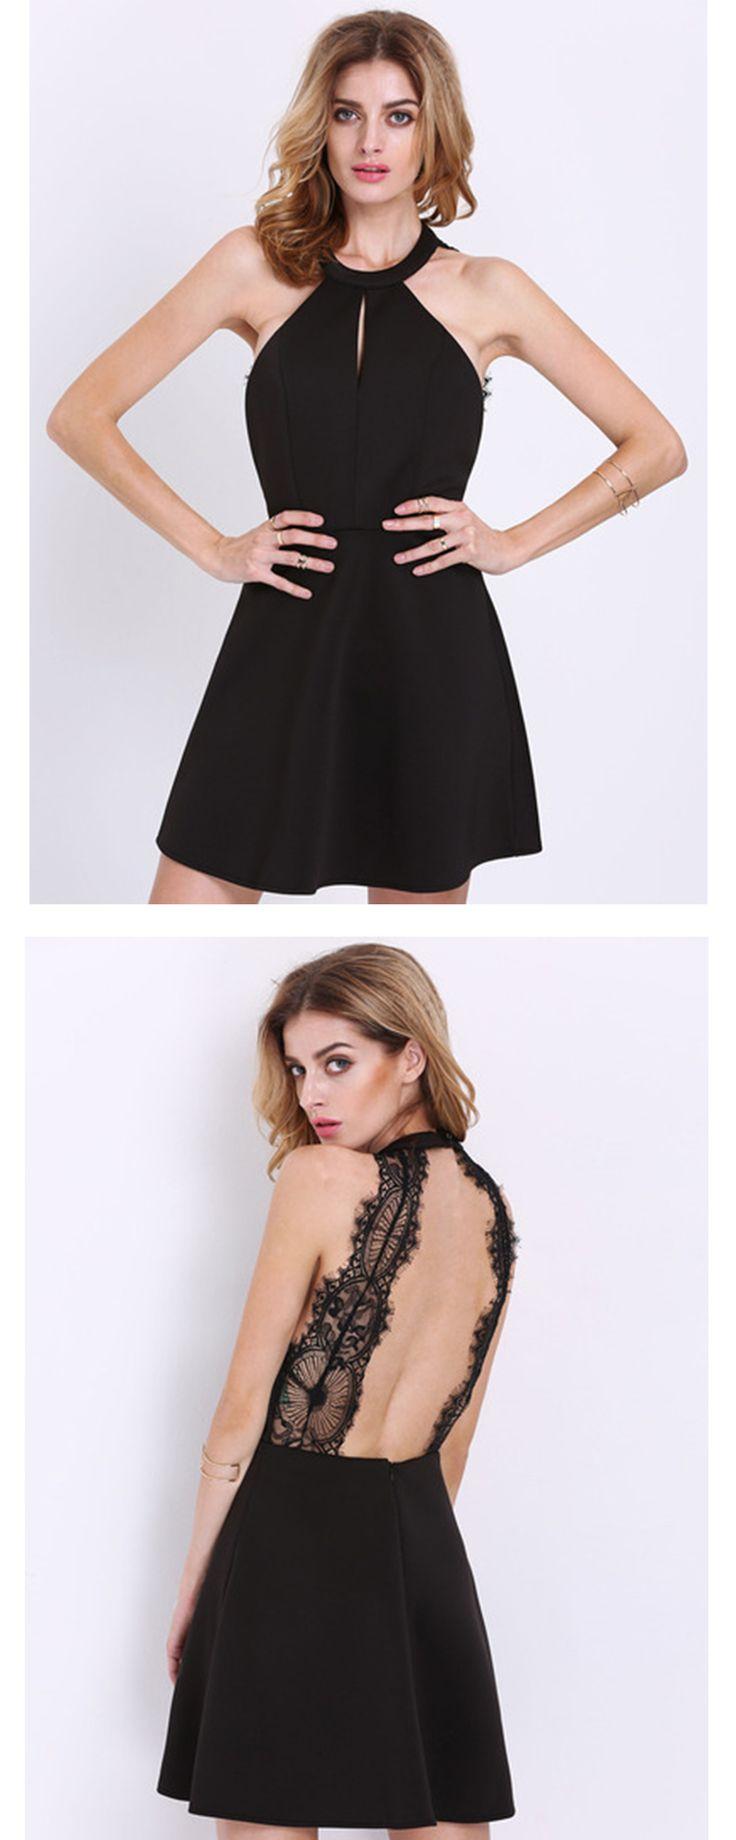 Black Halter Contrast Scallop Lace Backless Dress